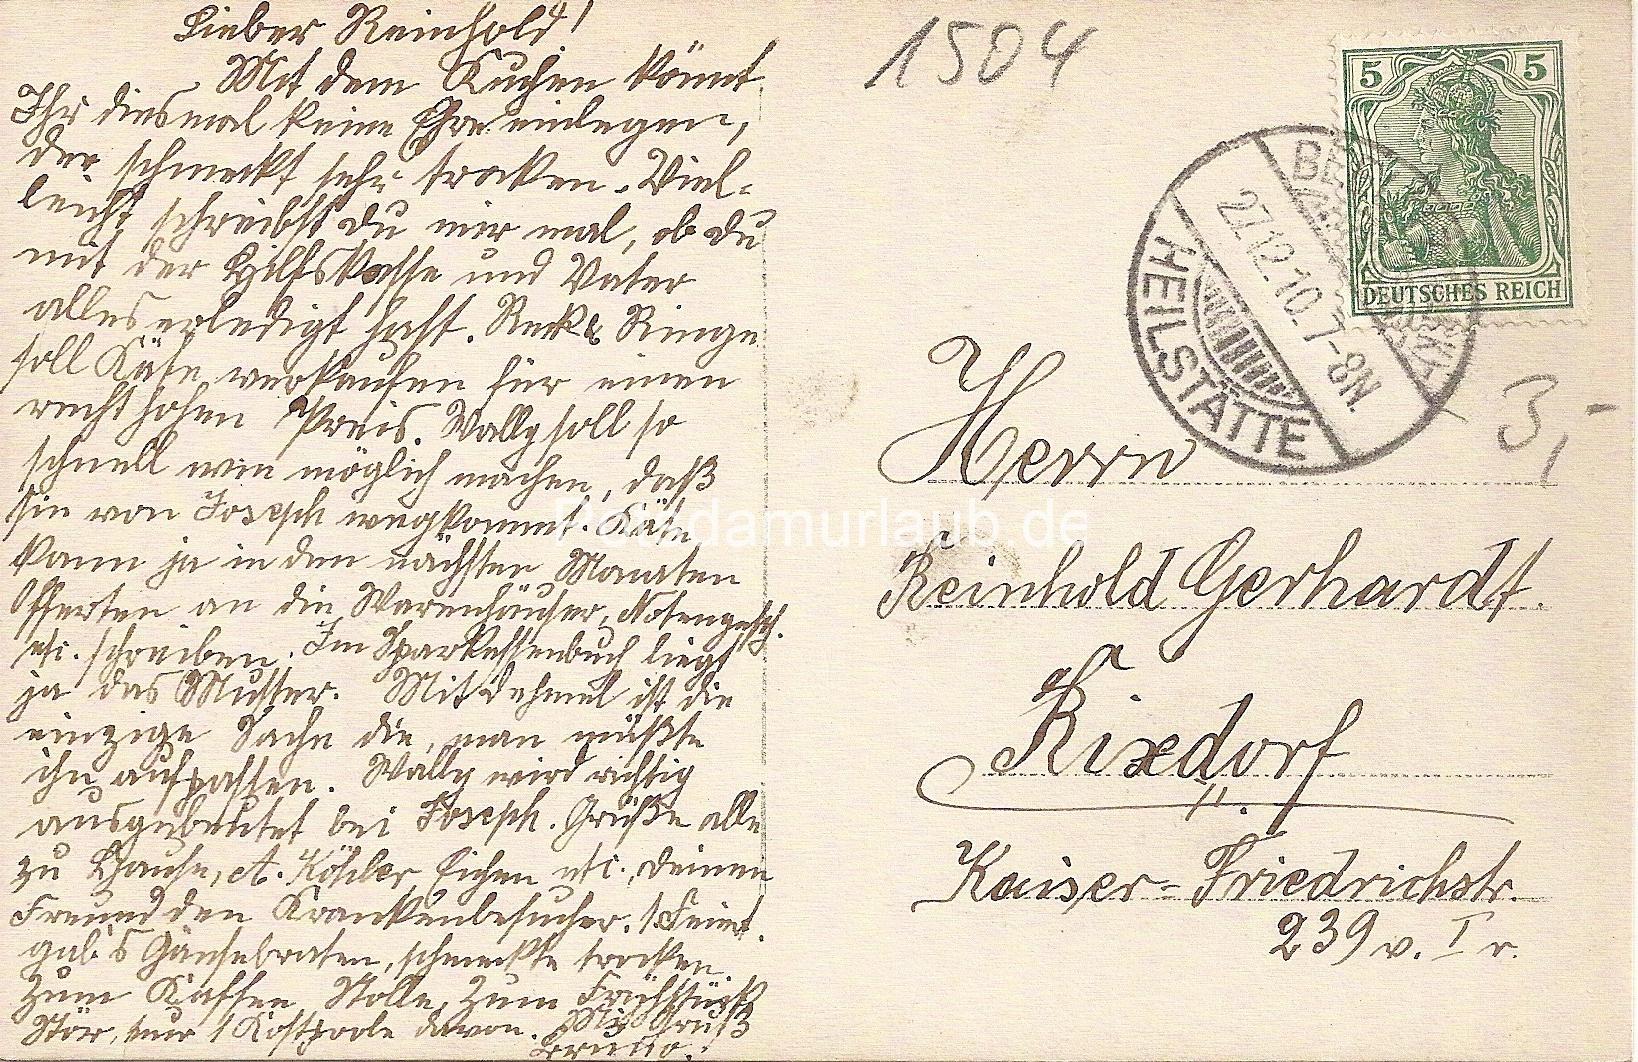 1910 12 27